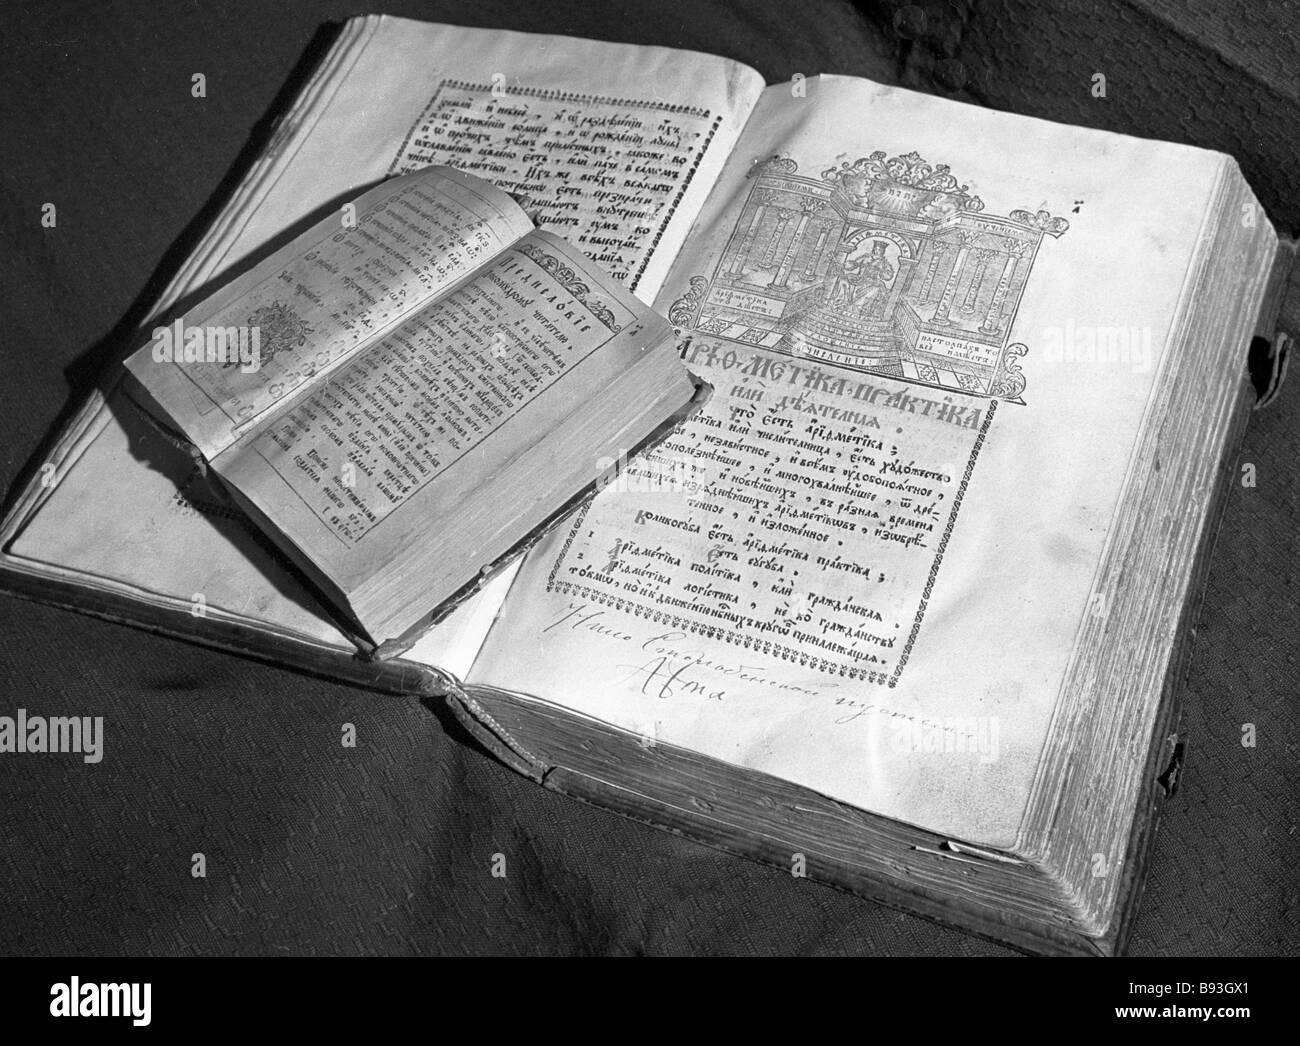 Slavonic Grammar by Melety Smotritsky and Arithmetics by Leonty Magnitsky Mikhail Lomonosov s first textbooks called - Stock Image